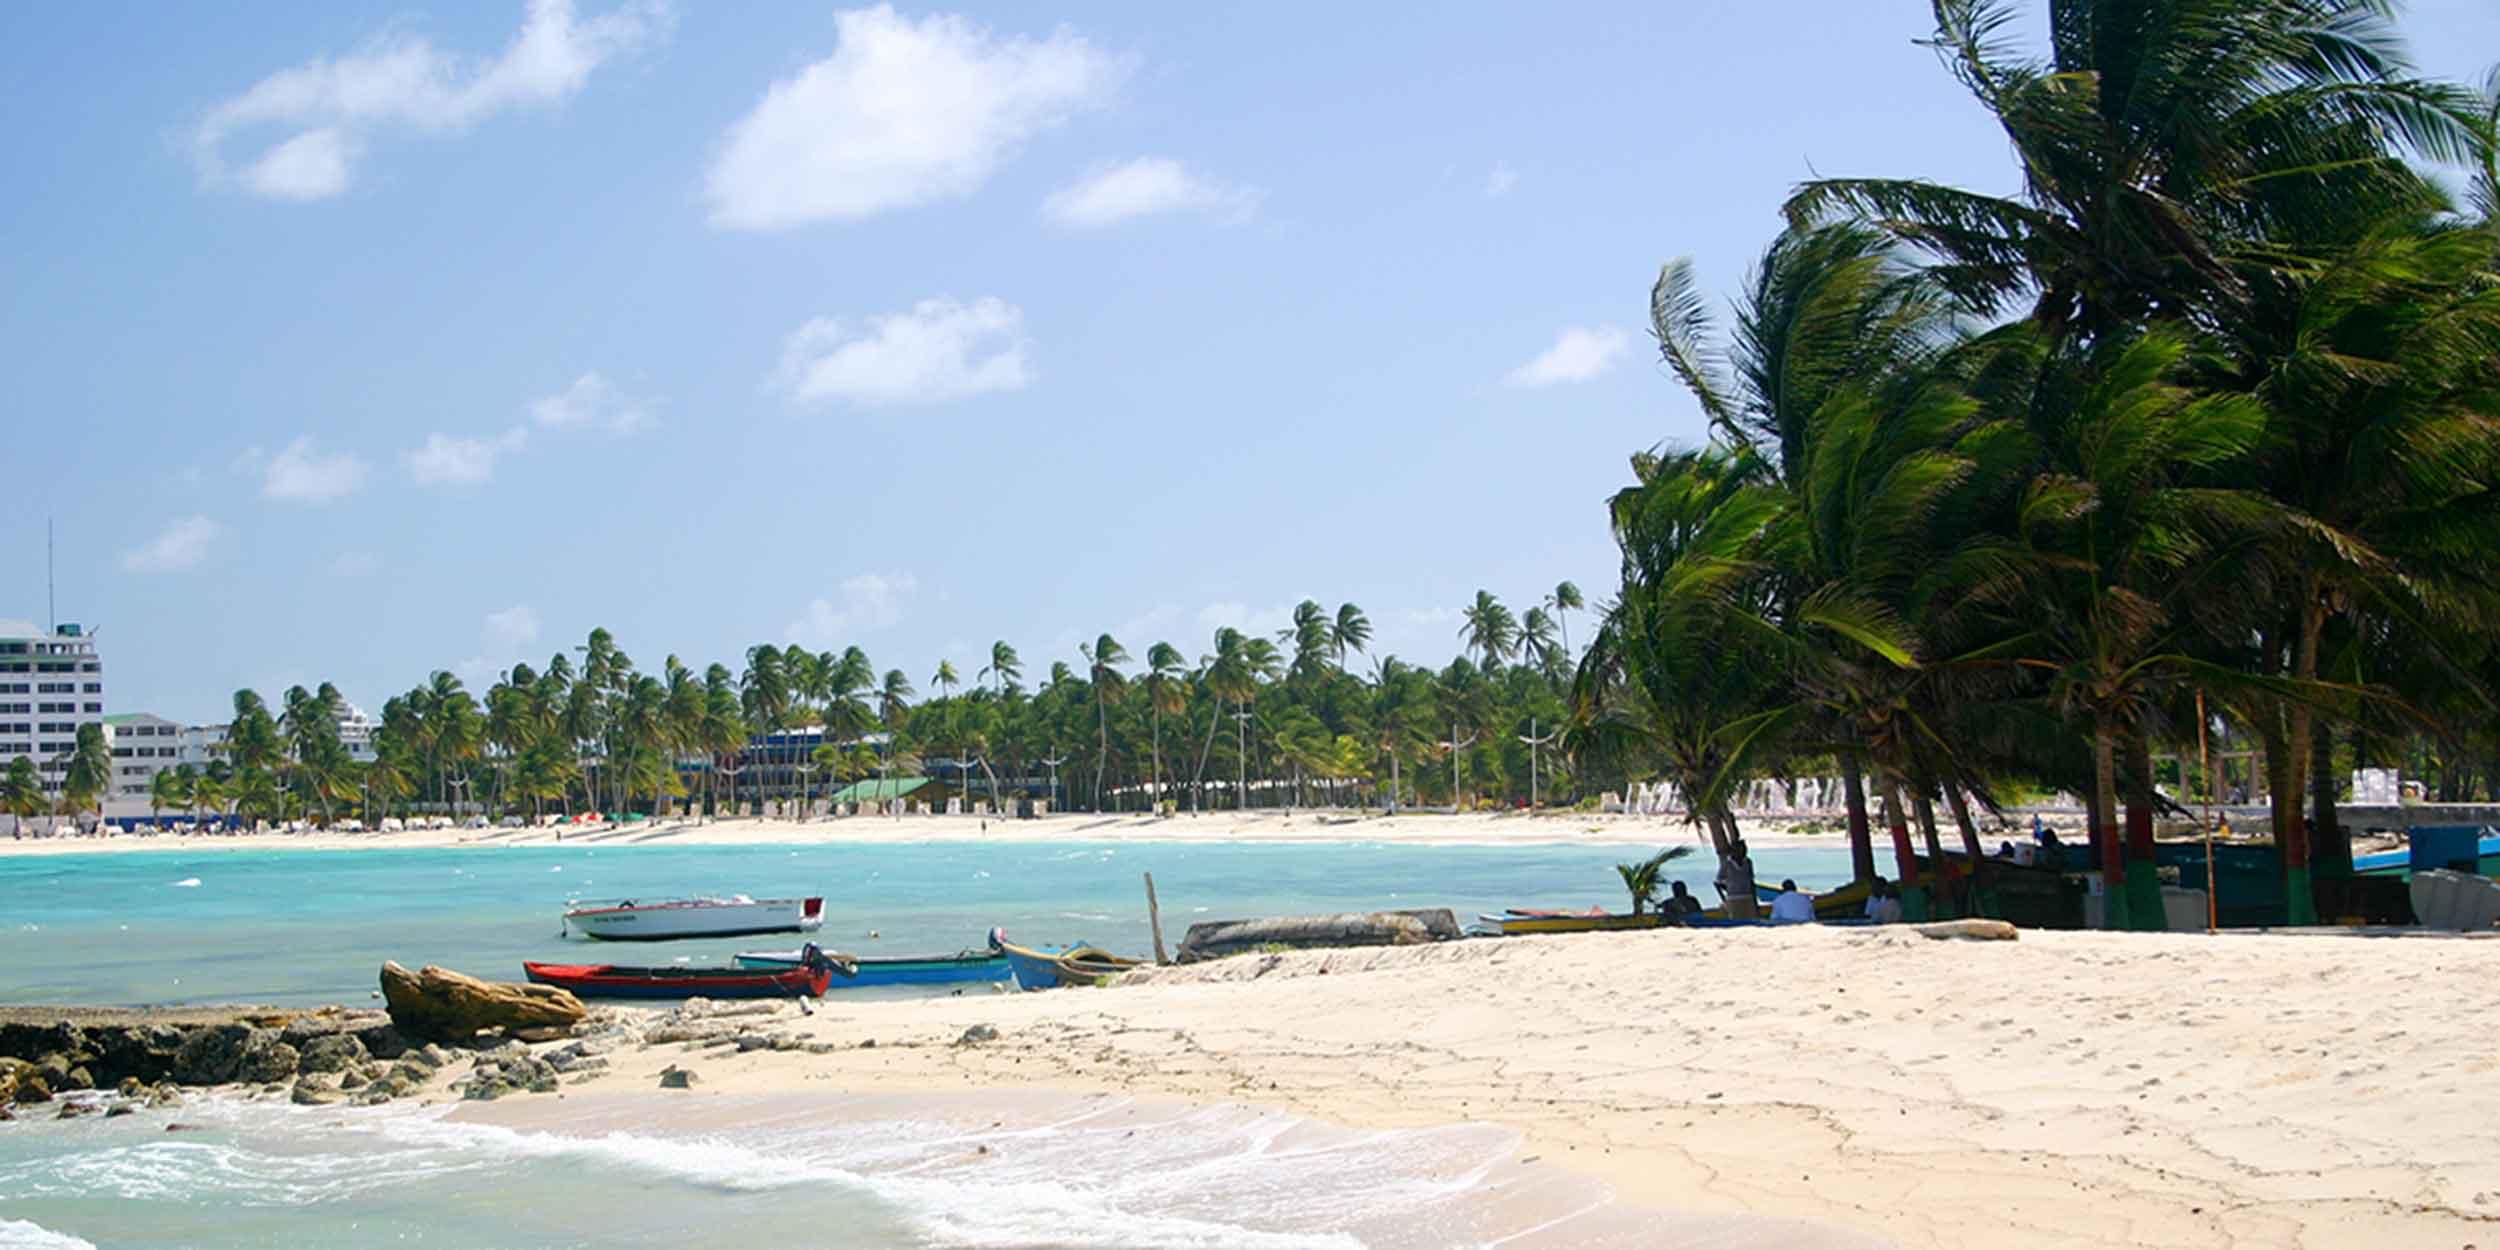 Cruise the Caribbean Sea from Miami to Costa Rica ...